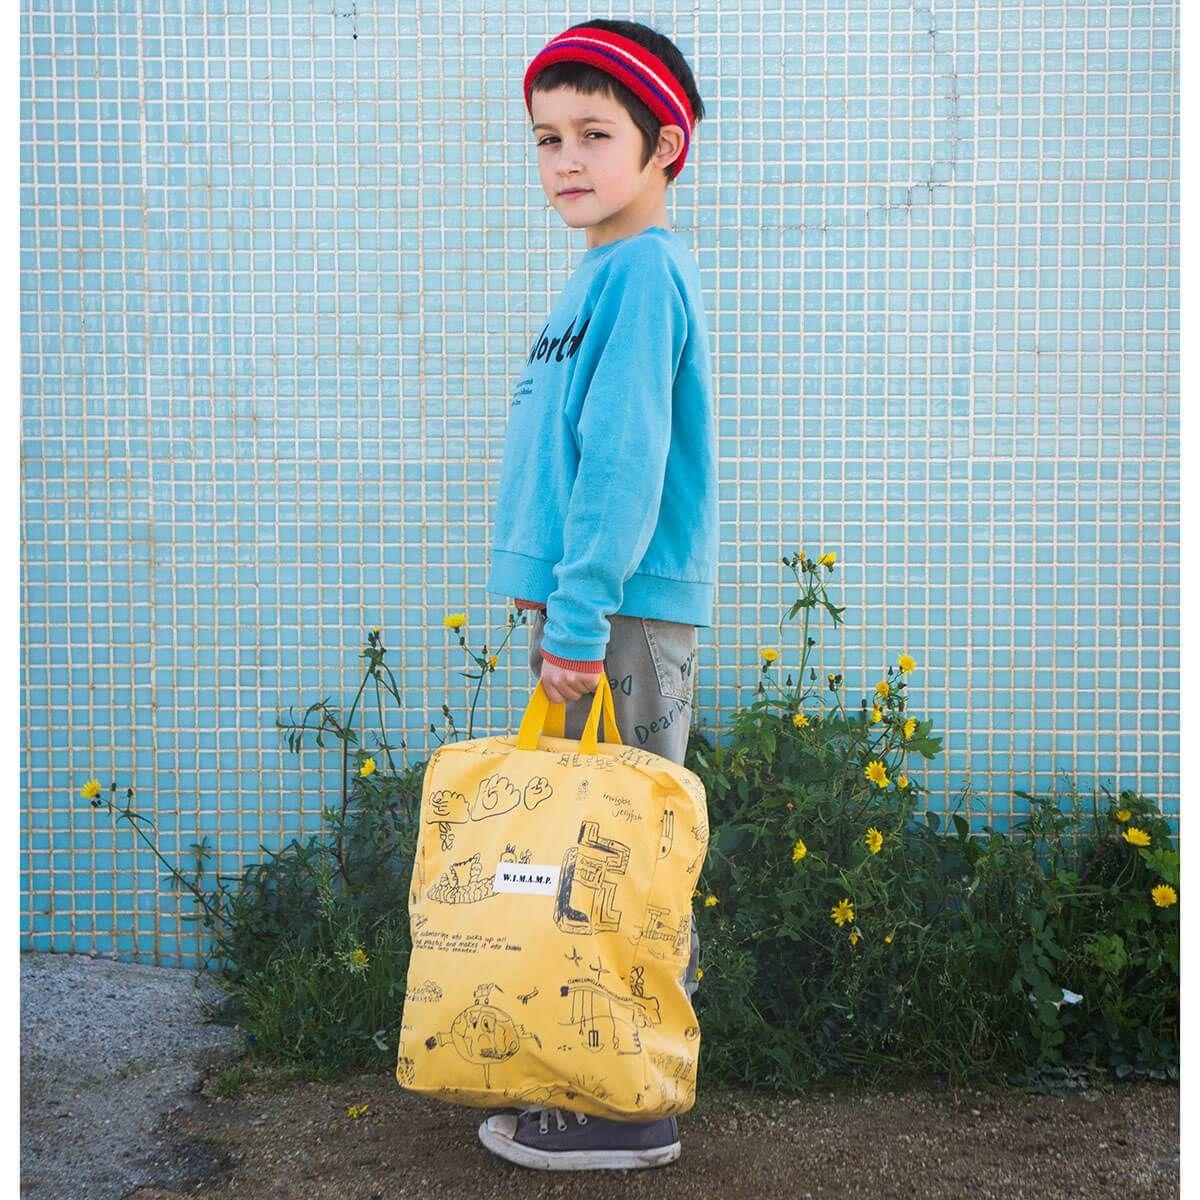 91c481447d8d W.I.M.A.M.P. School Bag in Yellow by Bobo Choses